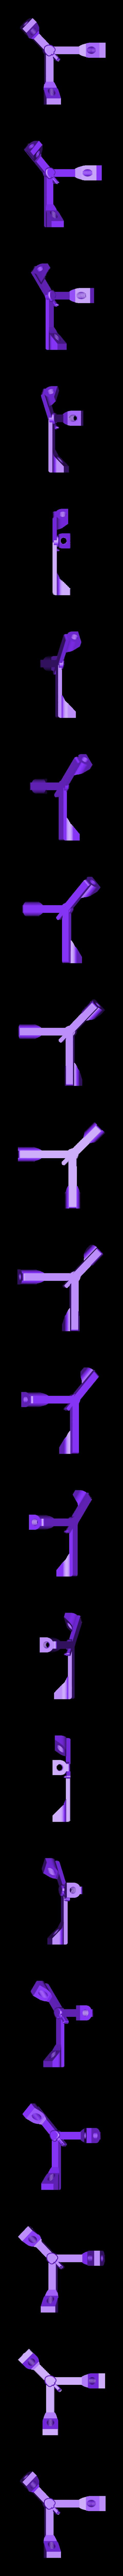 Model_Bird.stl Download free STL file Model for Balancing Bird • 3D print model, LGBU